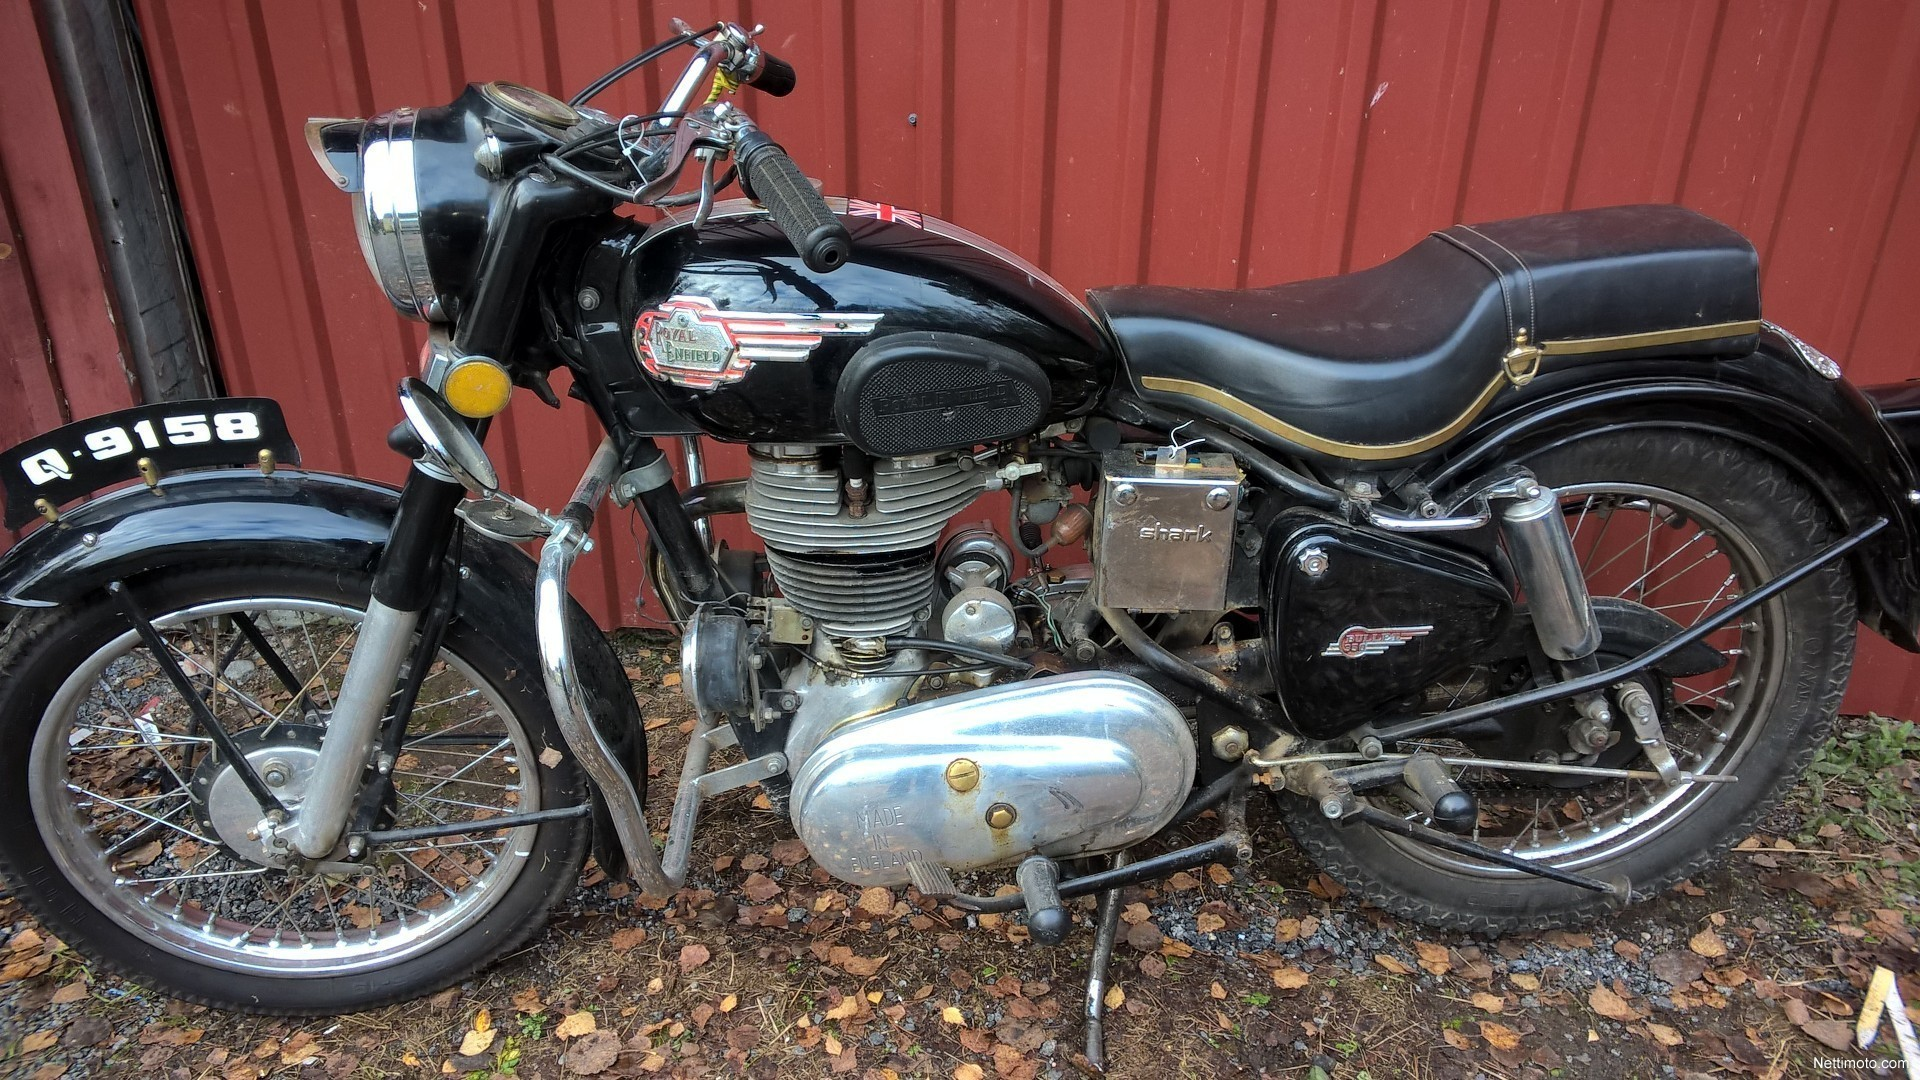 Royal Enfield Bullet 350 Cm 179 1957 Ristiina Motorcycle border=